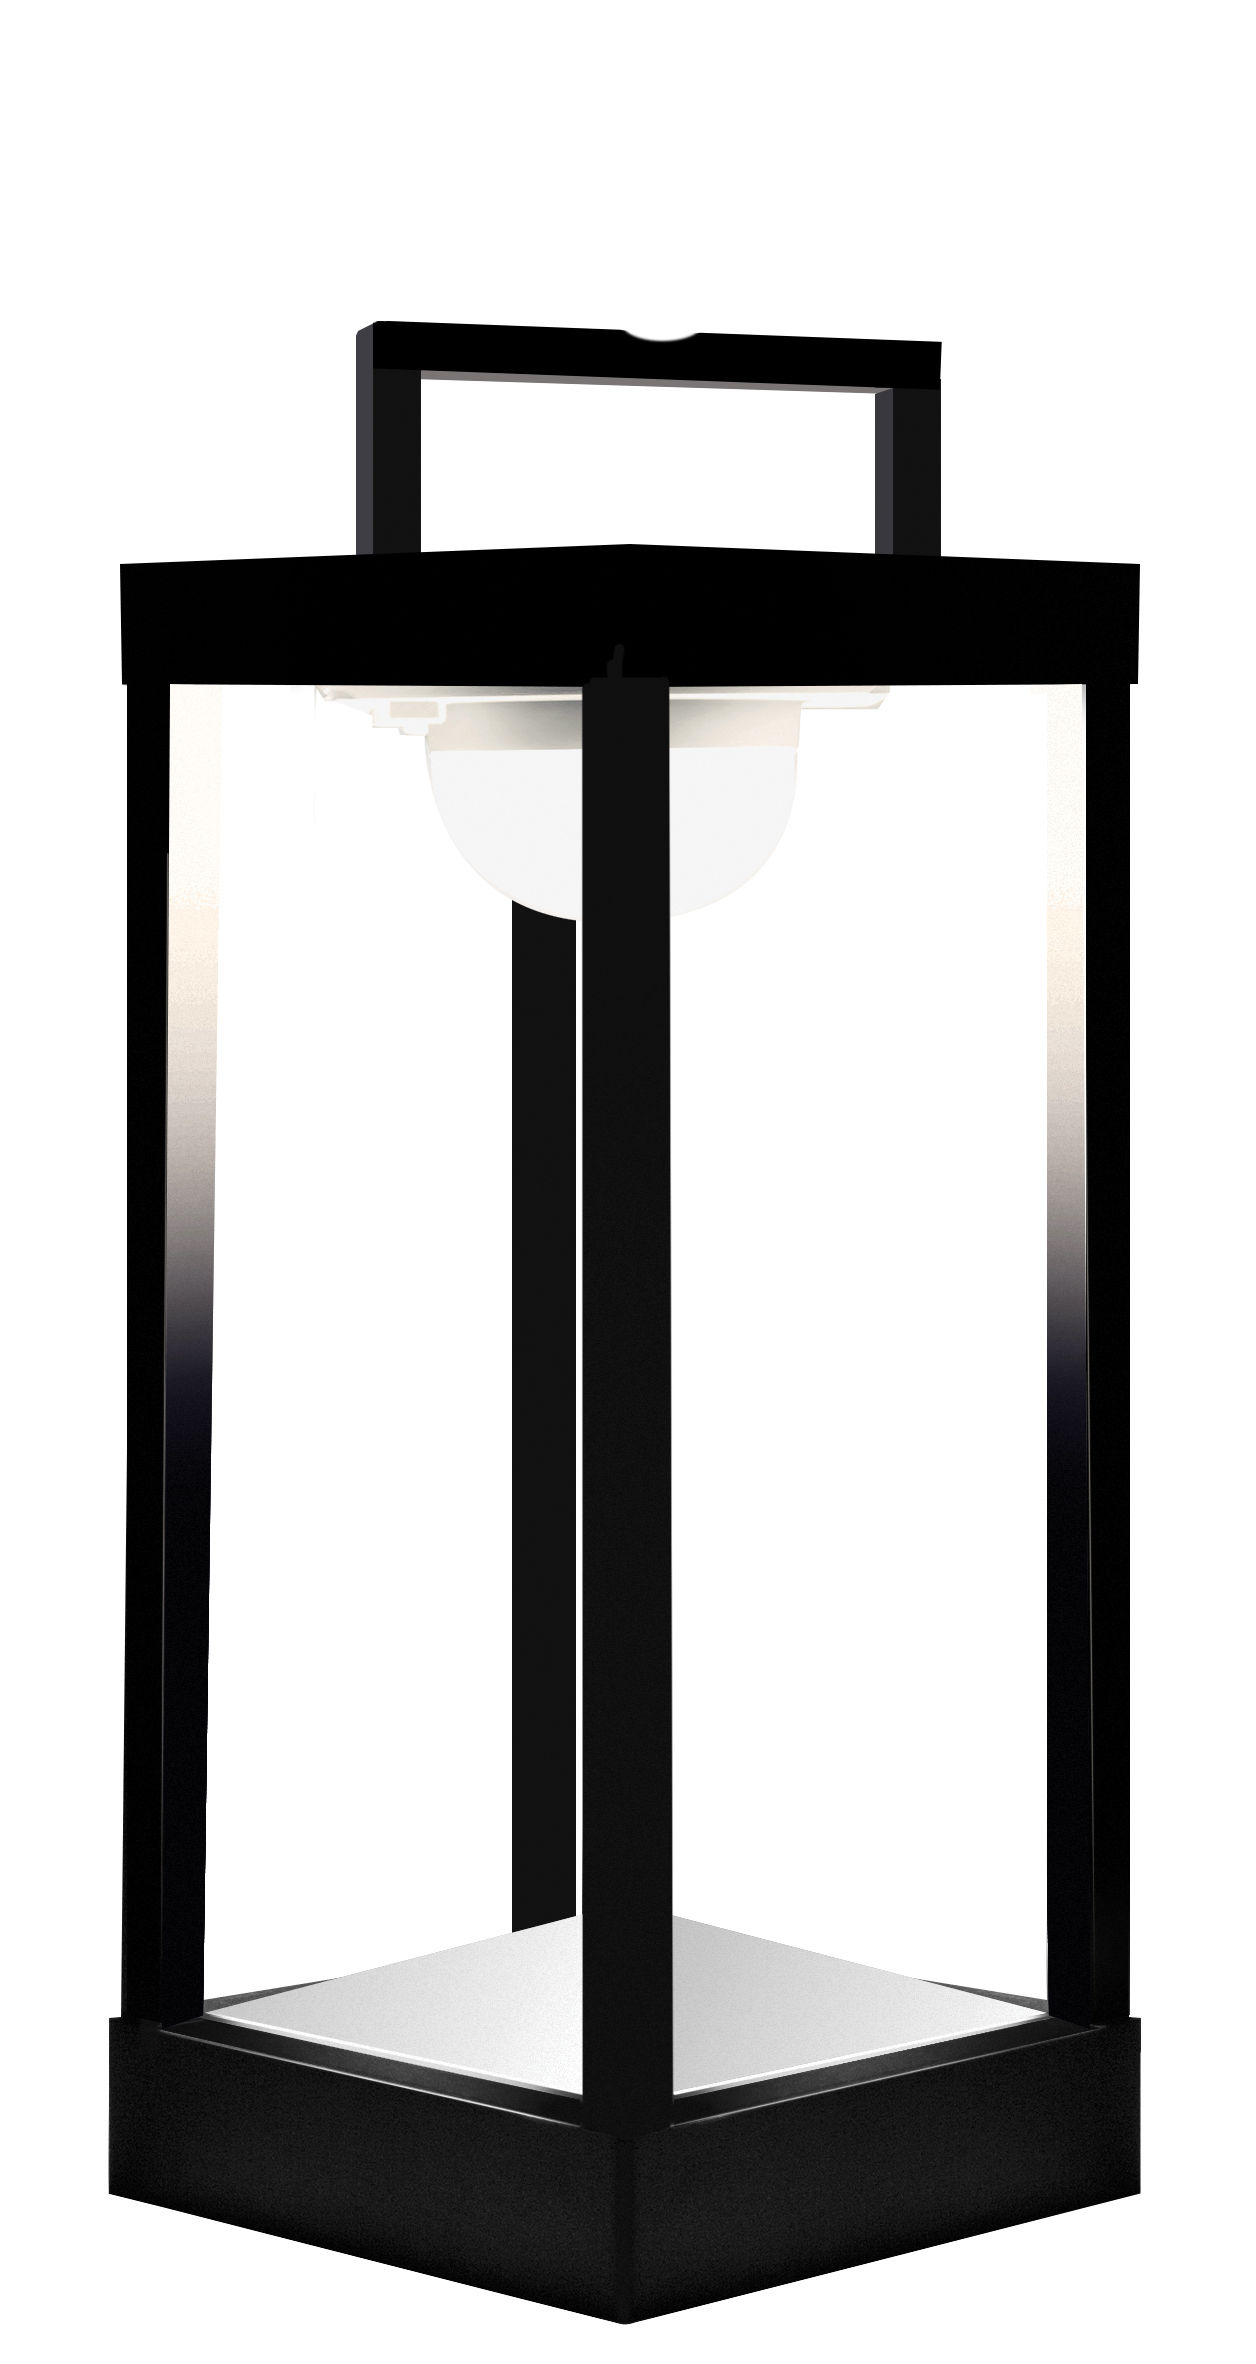 Lighting - Table Lamps - La Lampe Parc M Solar lamp - LED - Wireless - H 40 cm by Maiori - Black - Aluminium, Glass